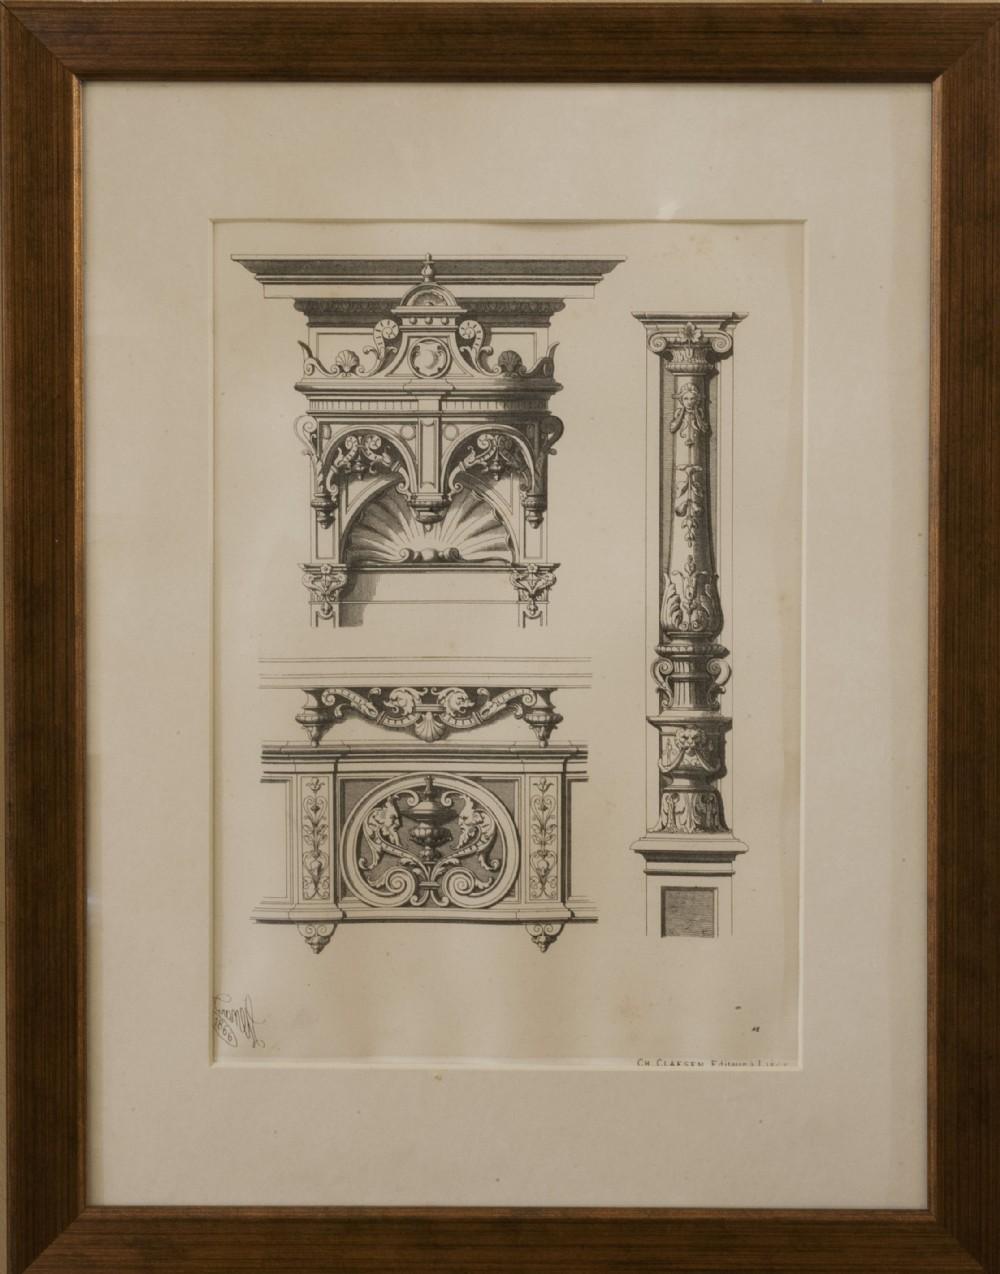 Set Of 4 Architectural Prints 274576 Sellingantiques Co Uk